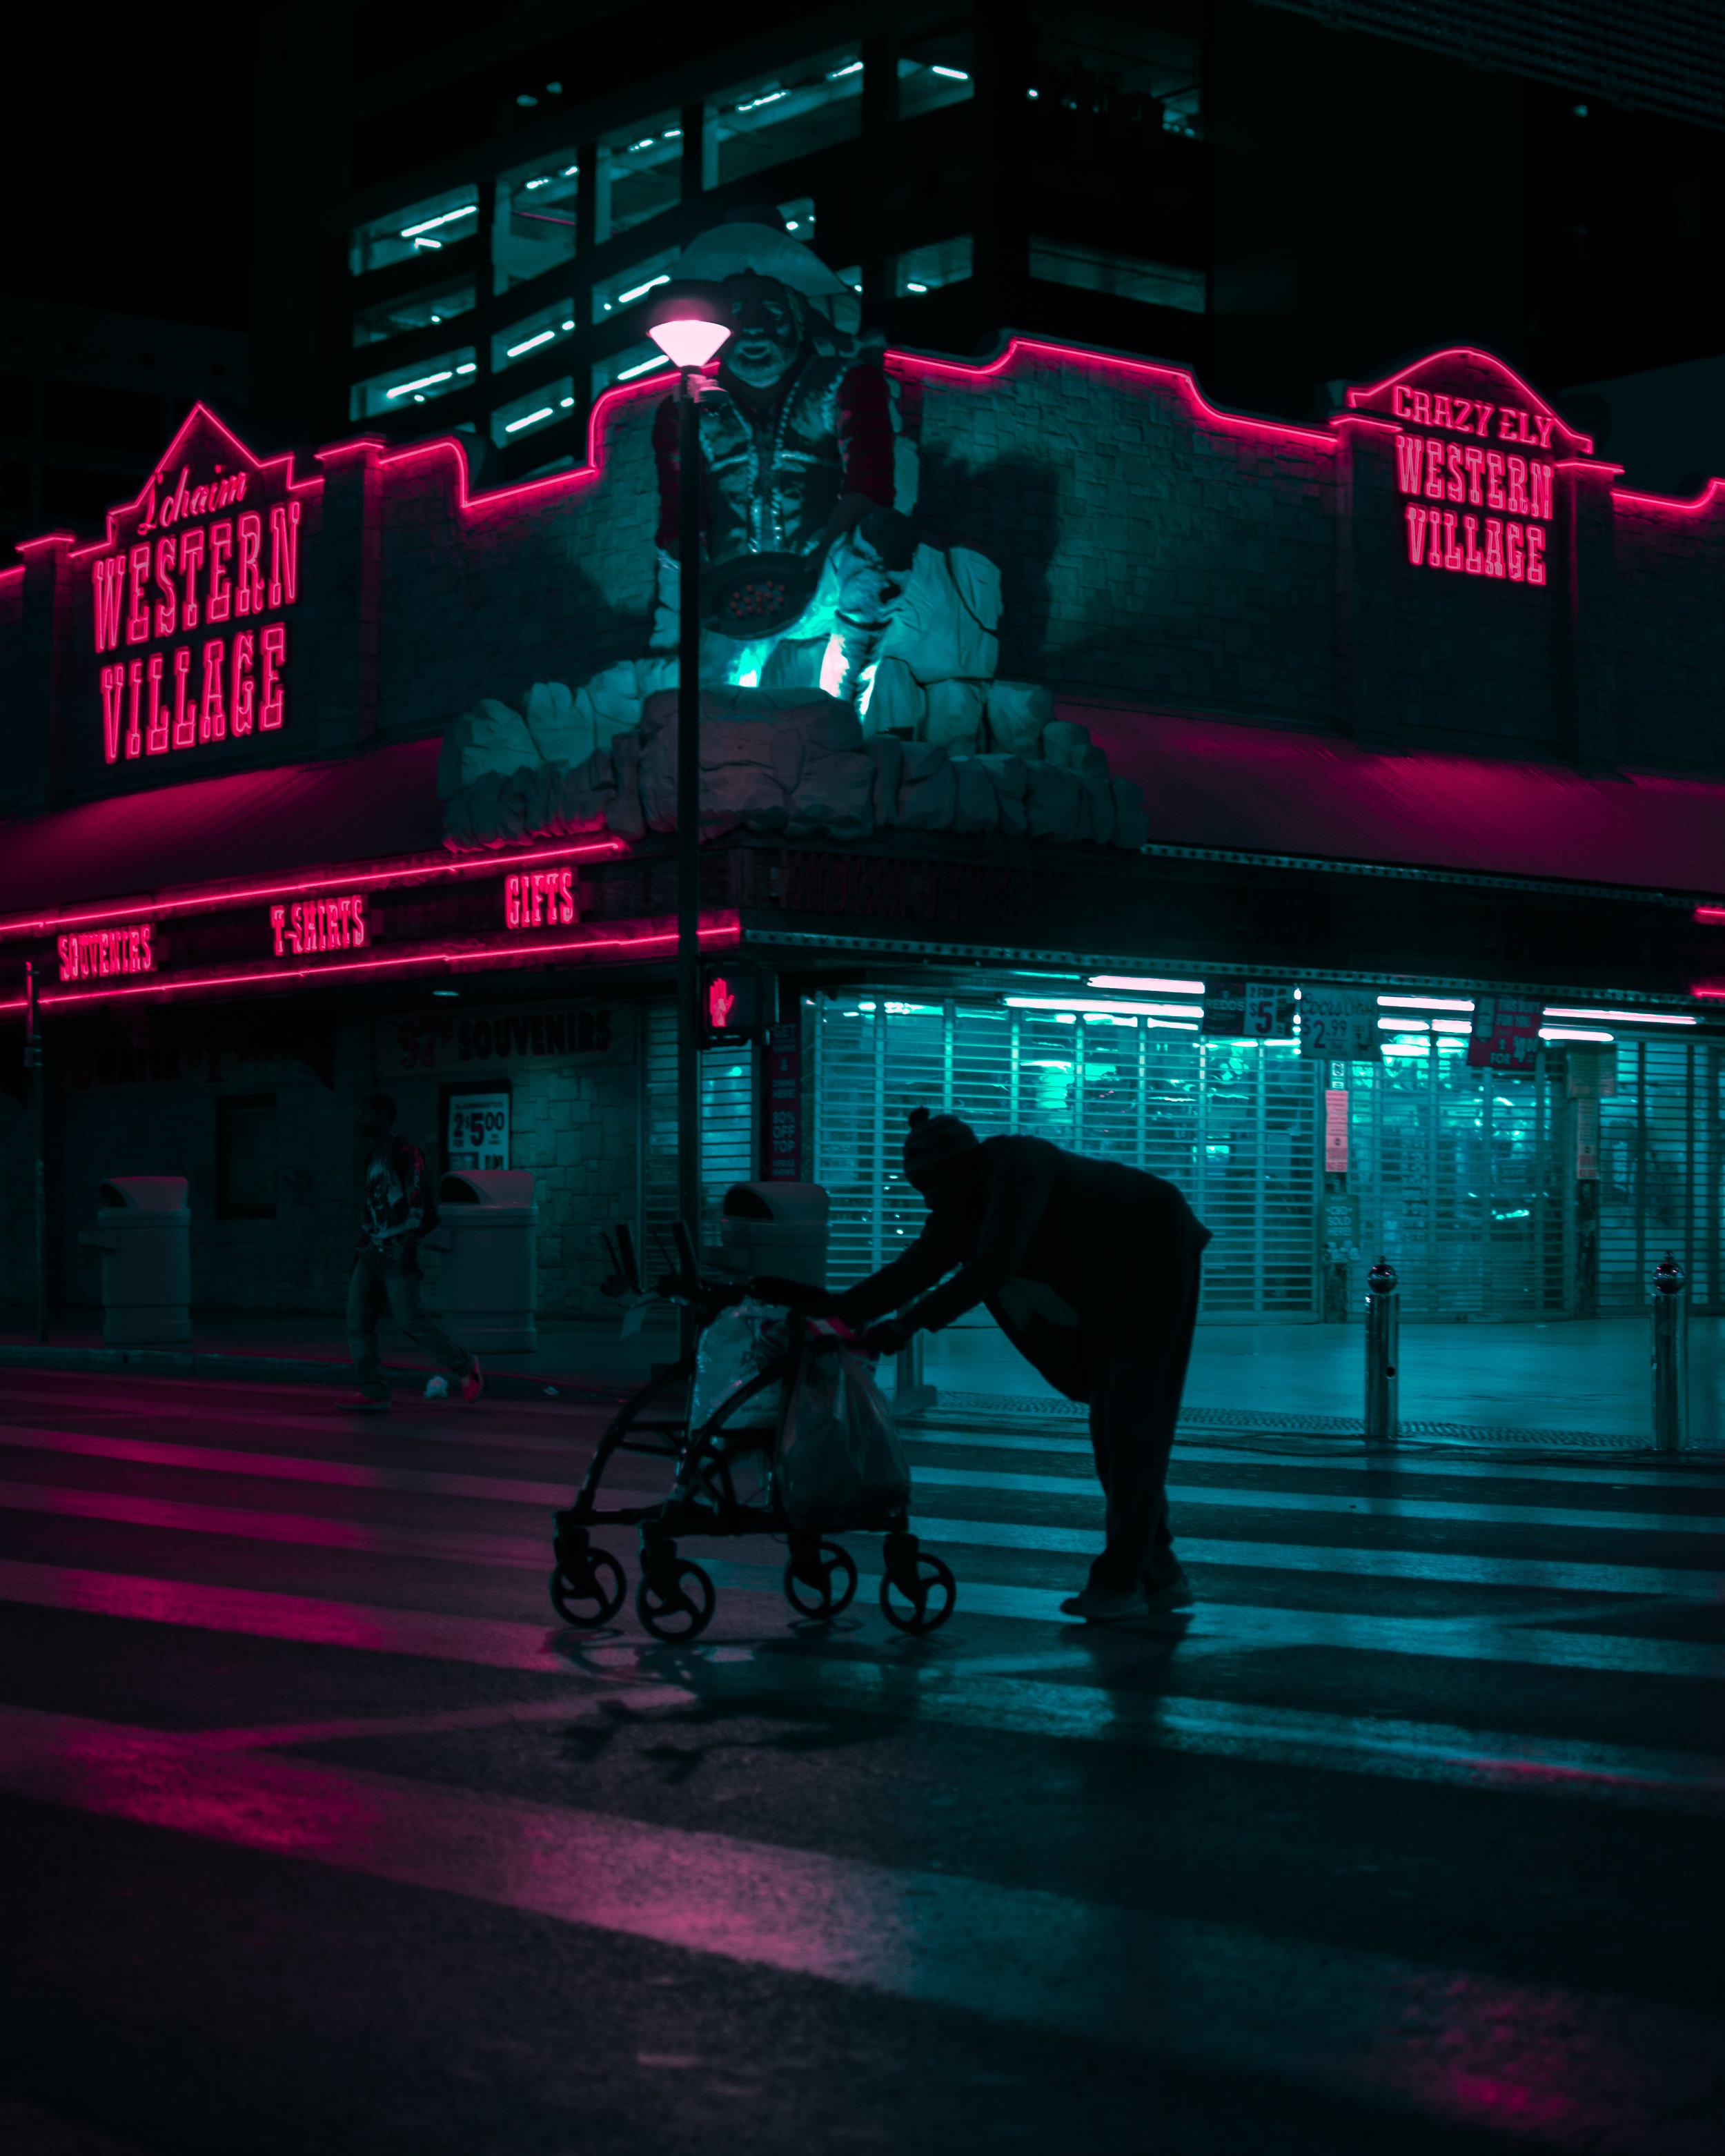 Samuel Albert - Las Vegas, Nevada, United States